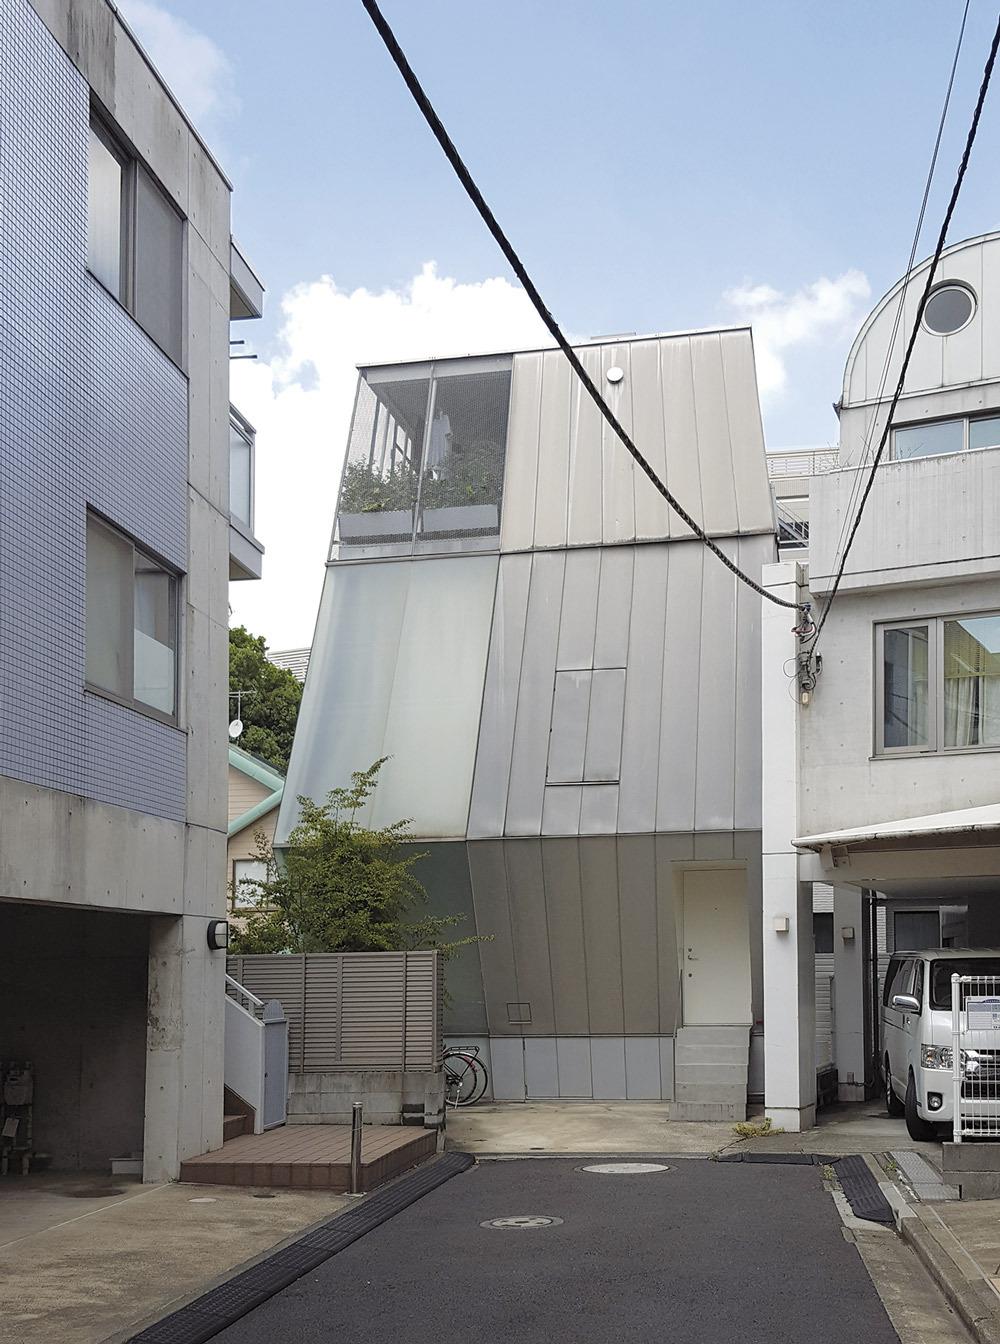 Picture of: Galeria De Diario De Viaje Por Tokio Arquitectura Y Manga 15